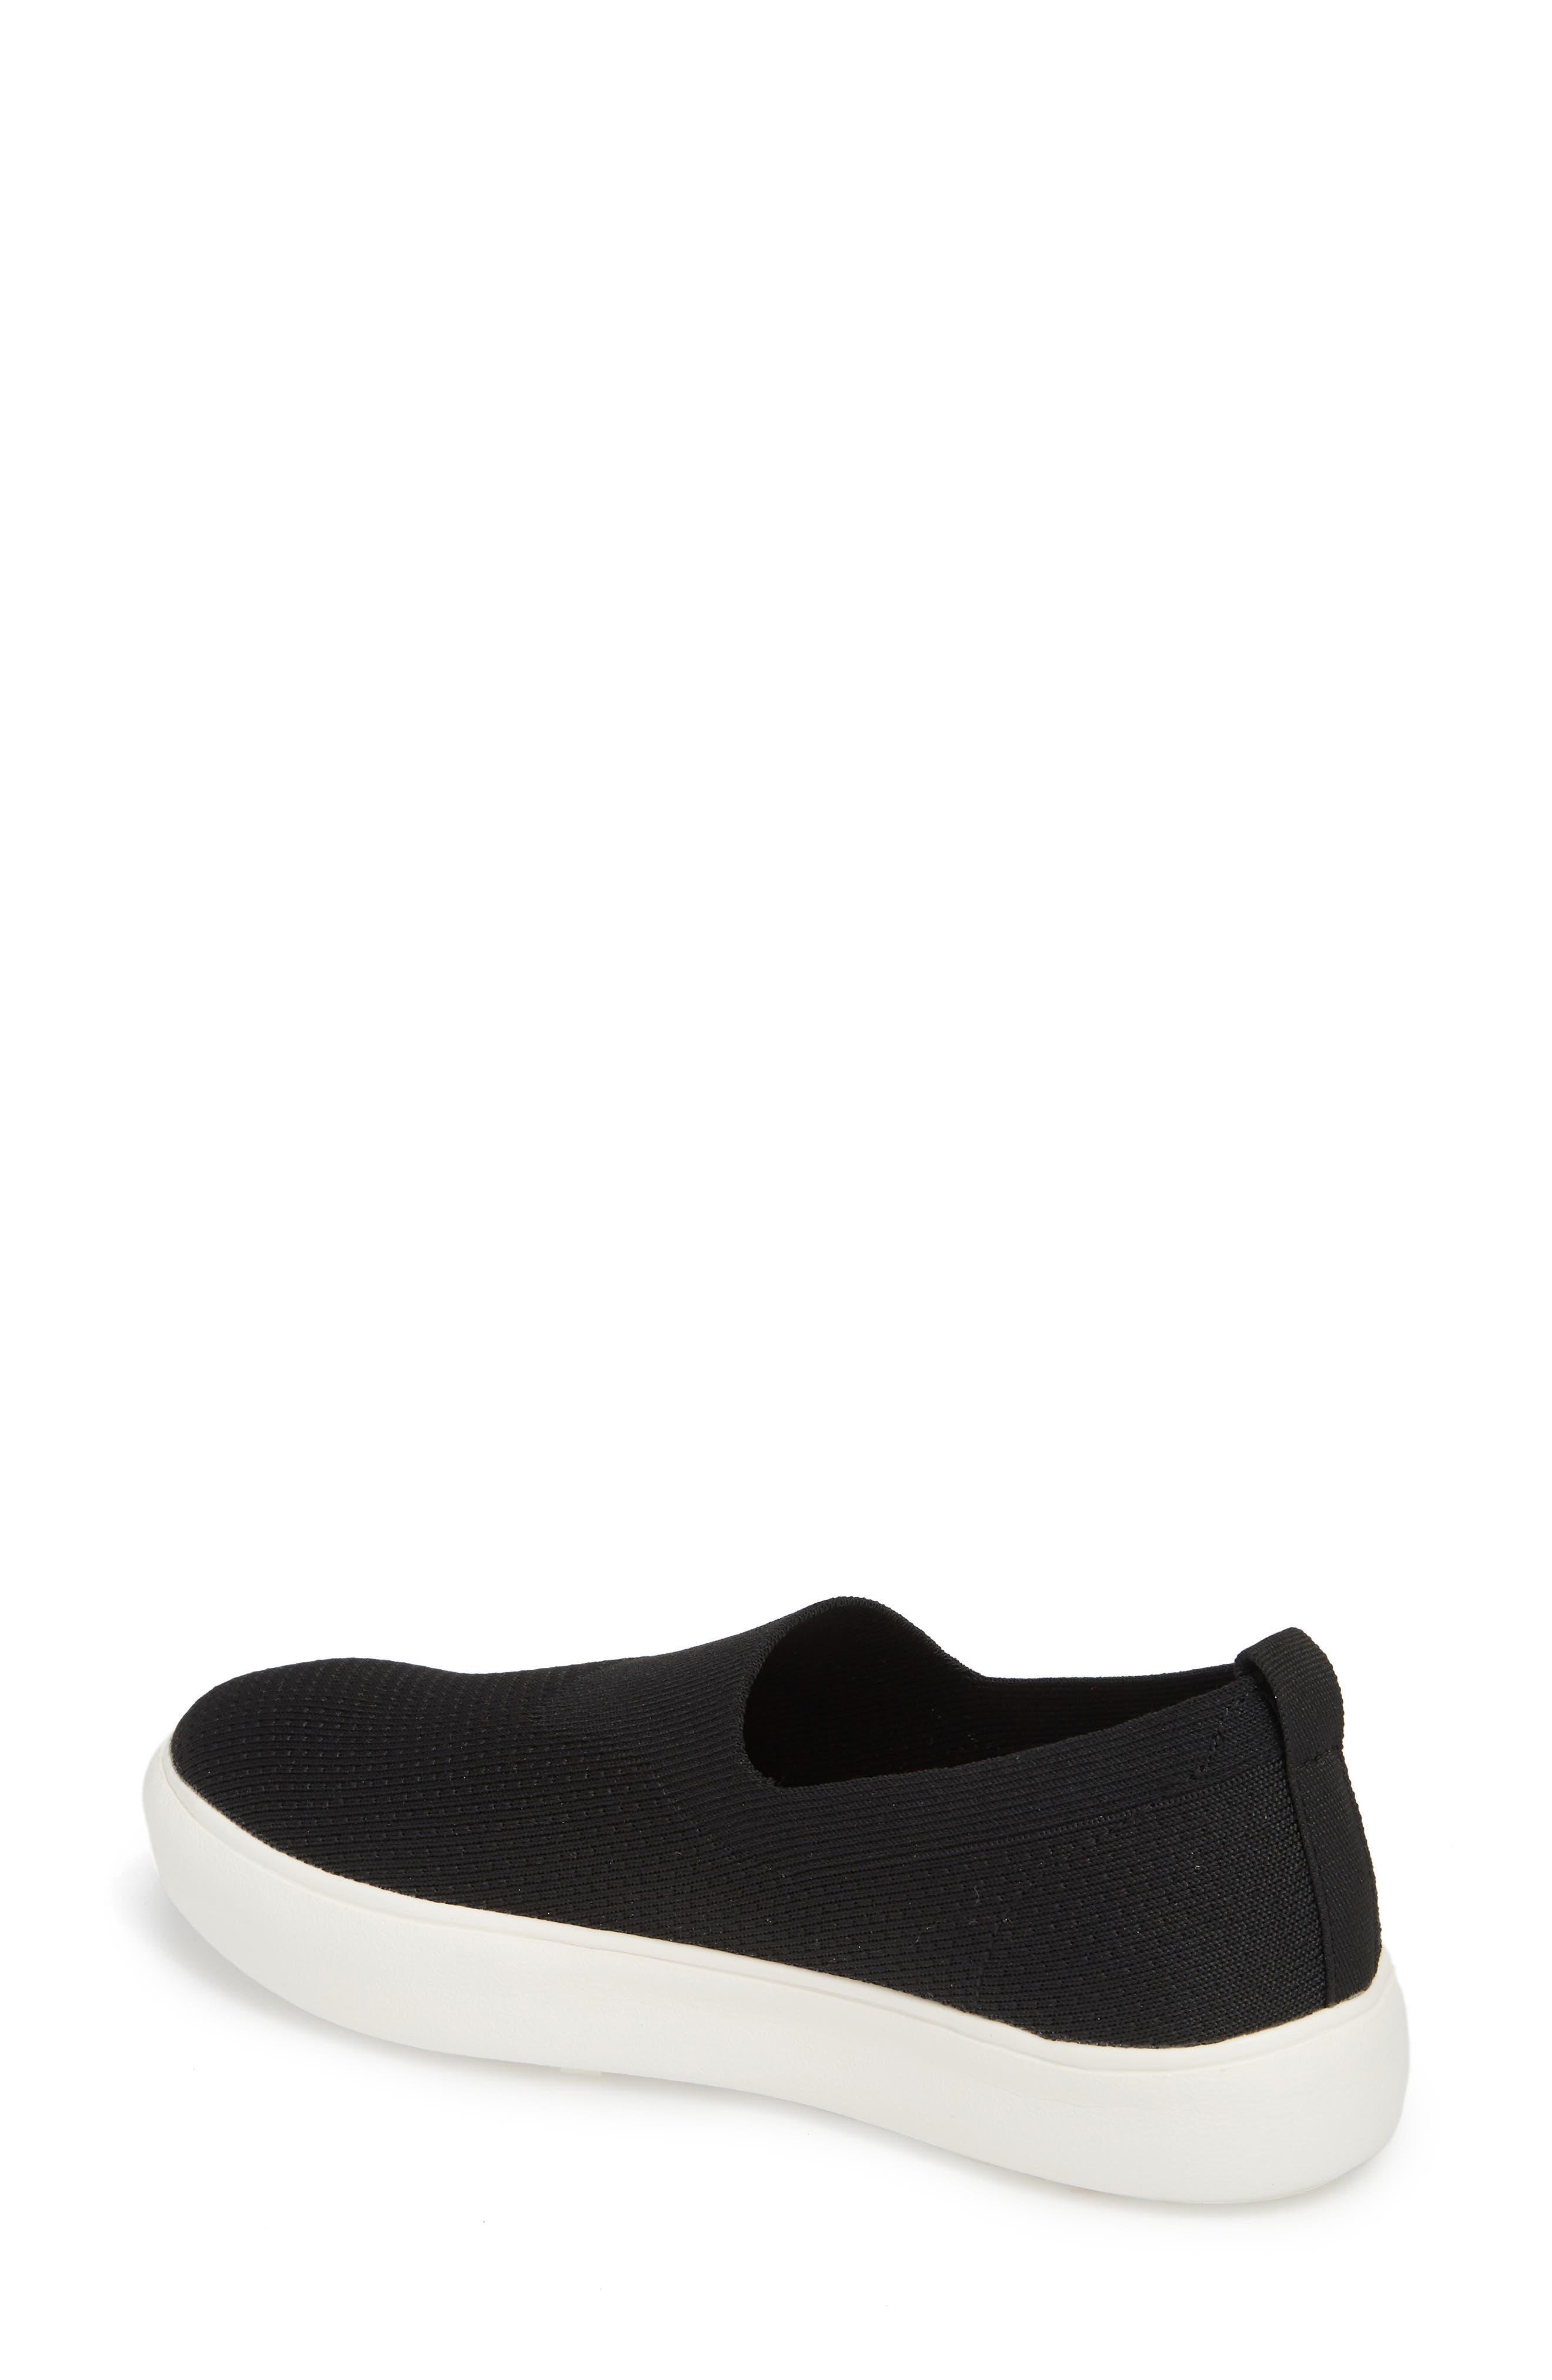 Hula Slip-On Sneaker,                             Alternate thumbnail 2, color,                             BLACK